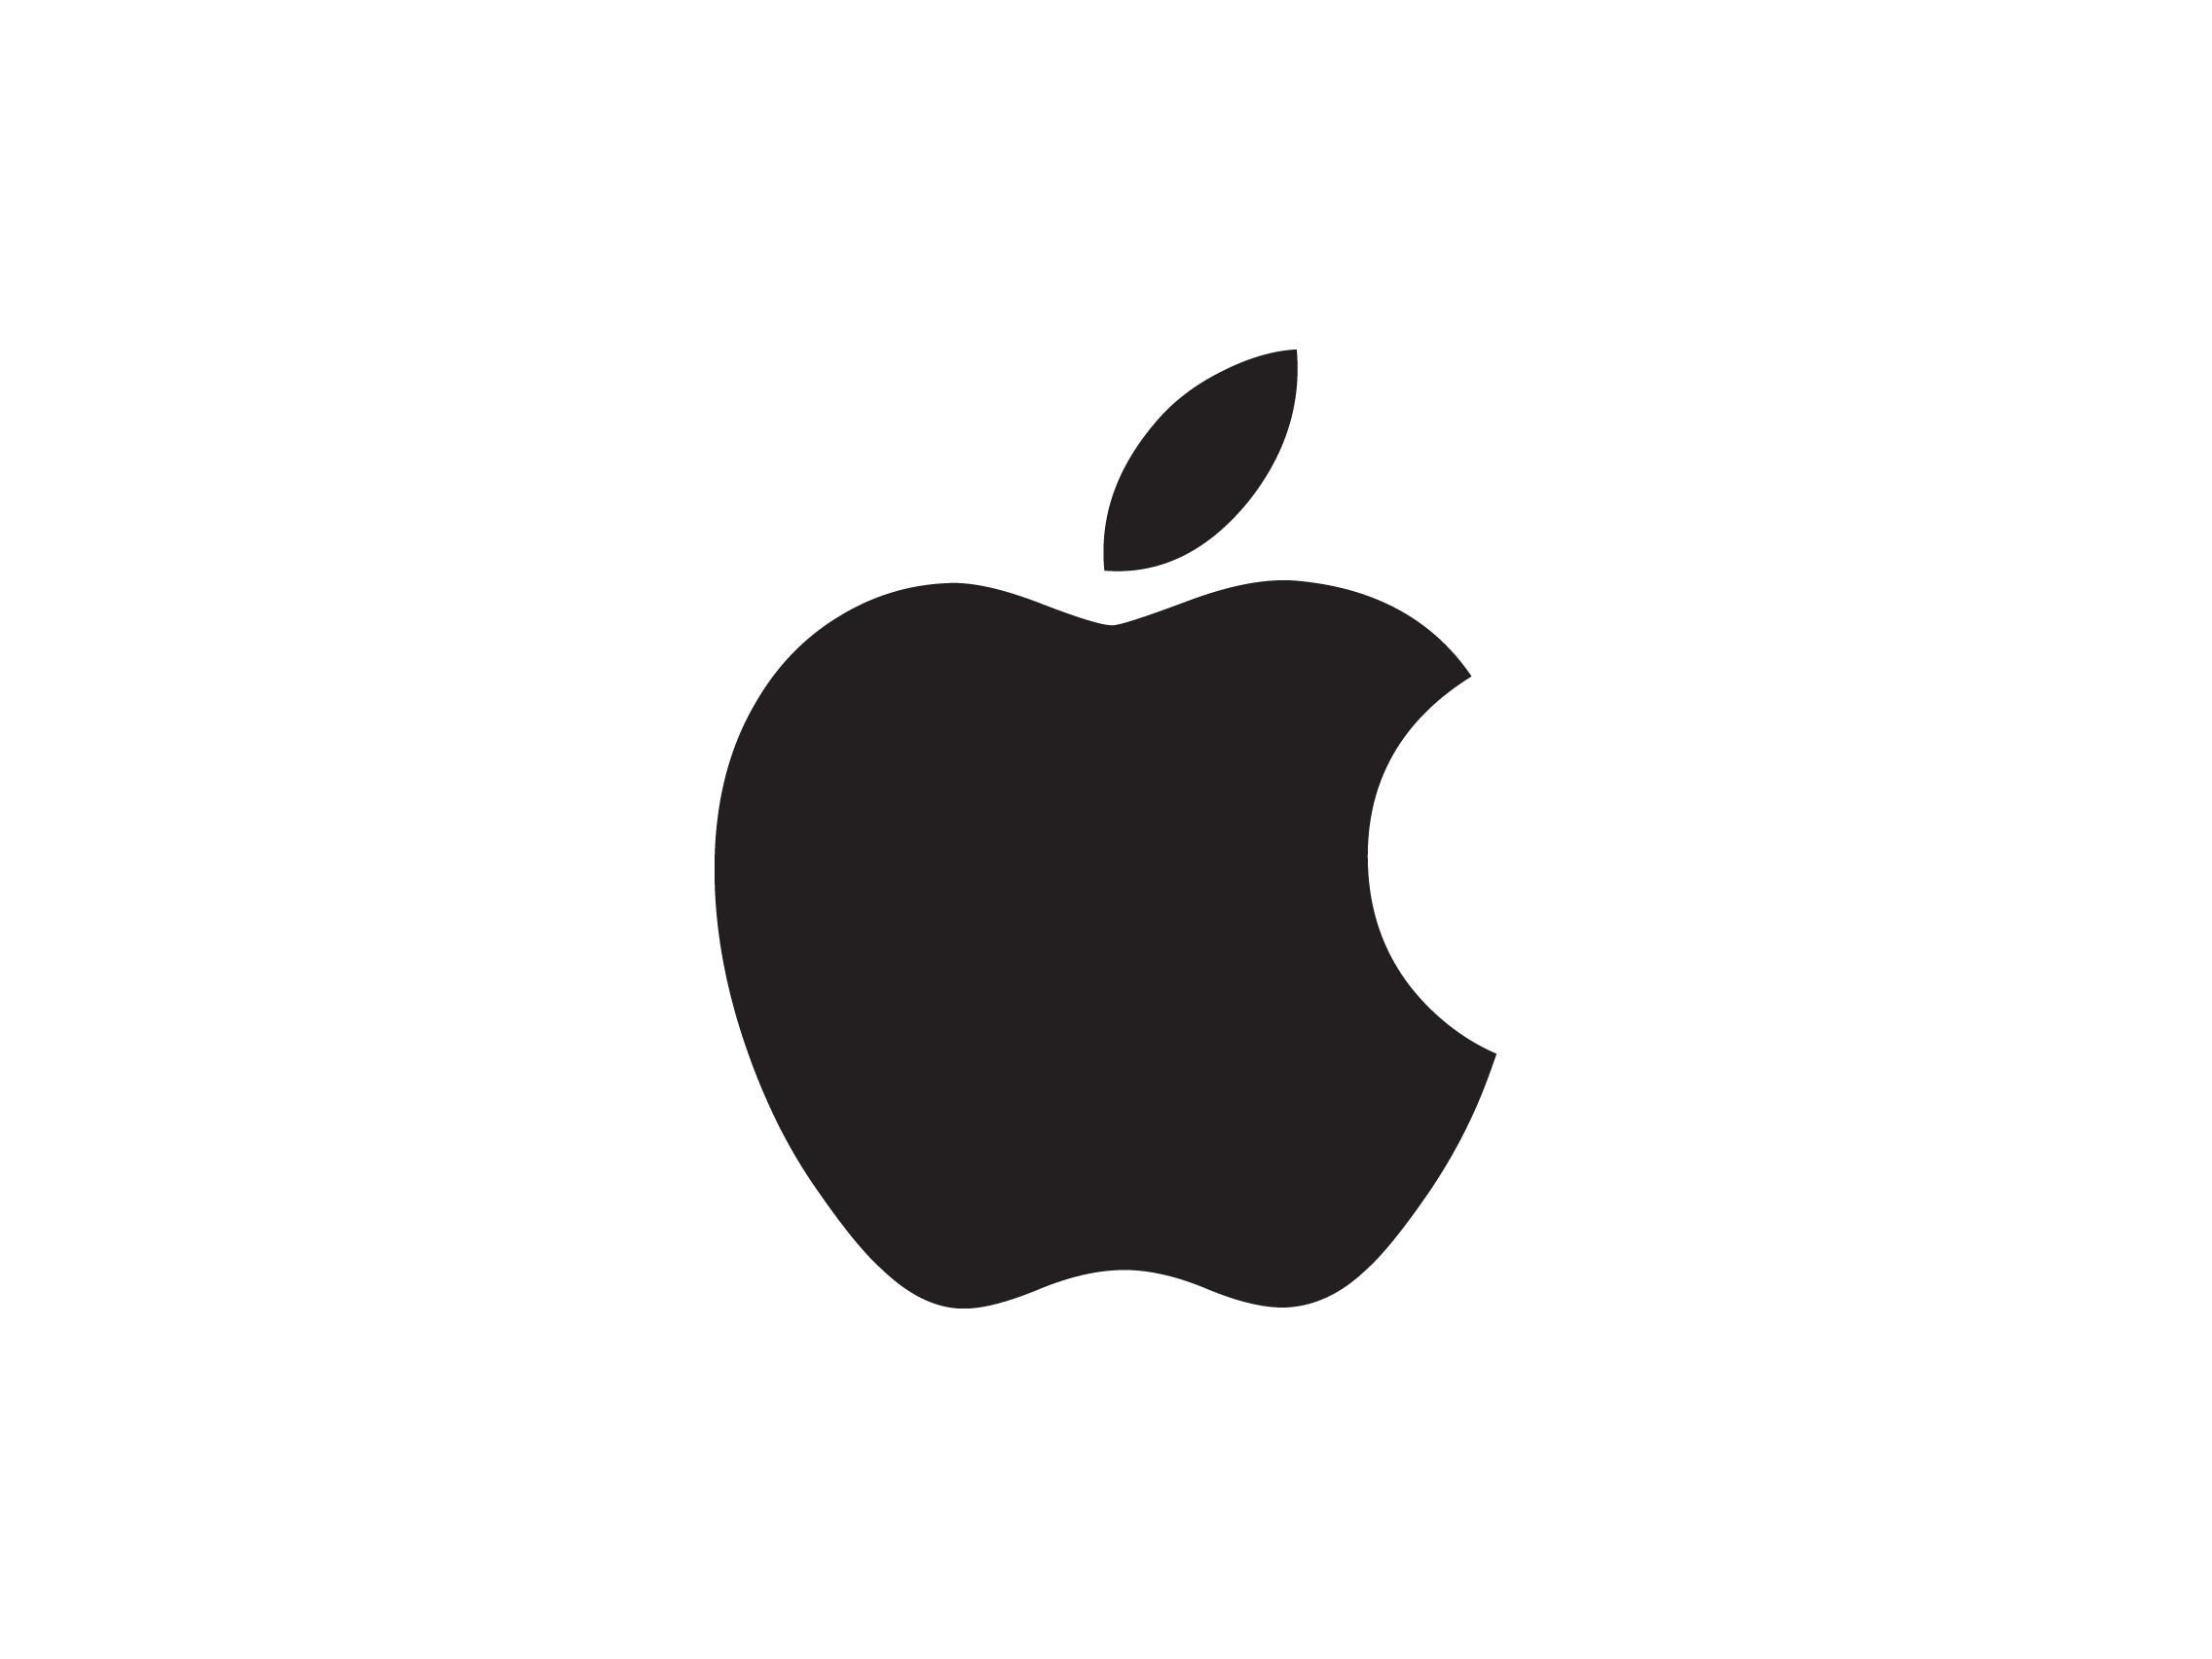 Apple Black Logo Wallpaper